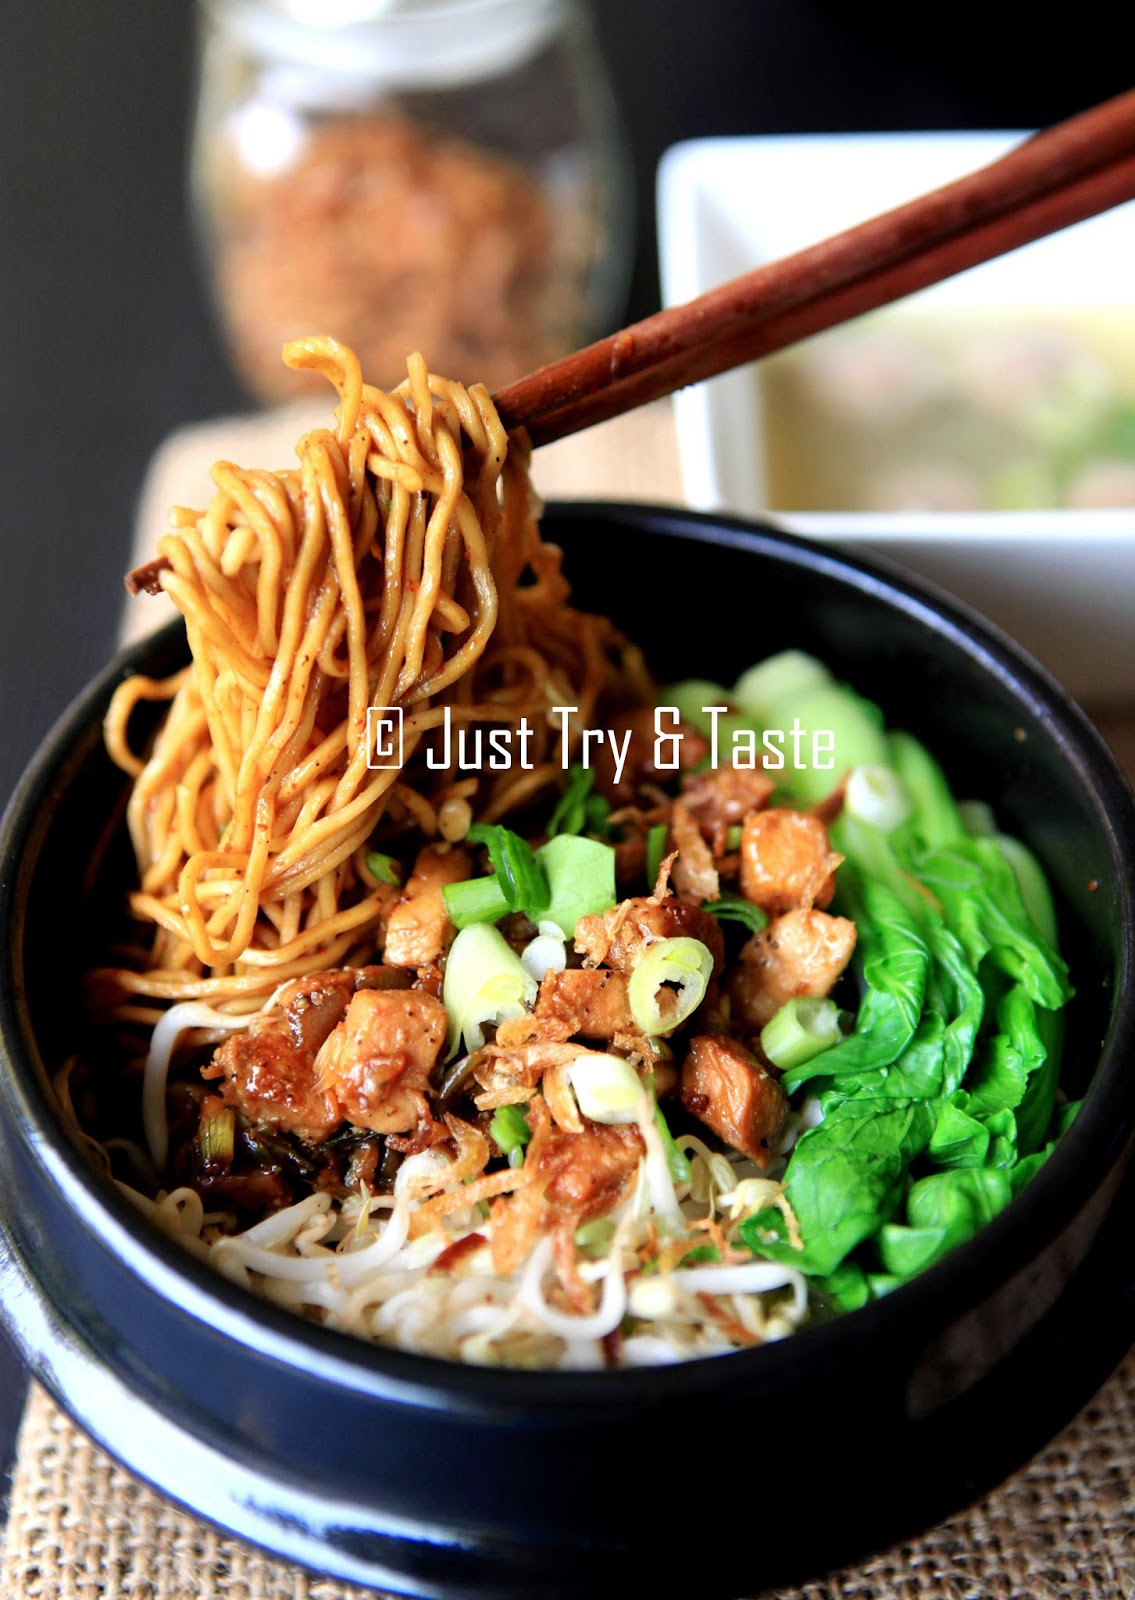 Resep Kuah Mie Ayam : resep, Yamin, Taste